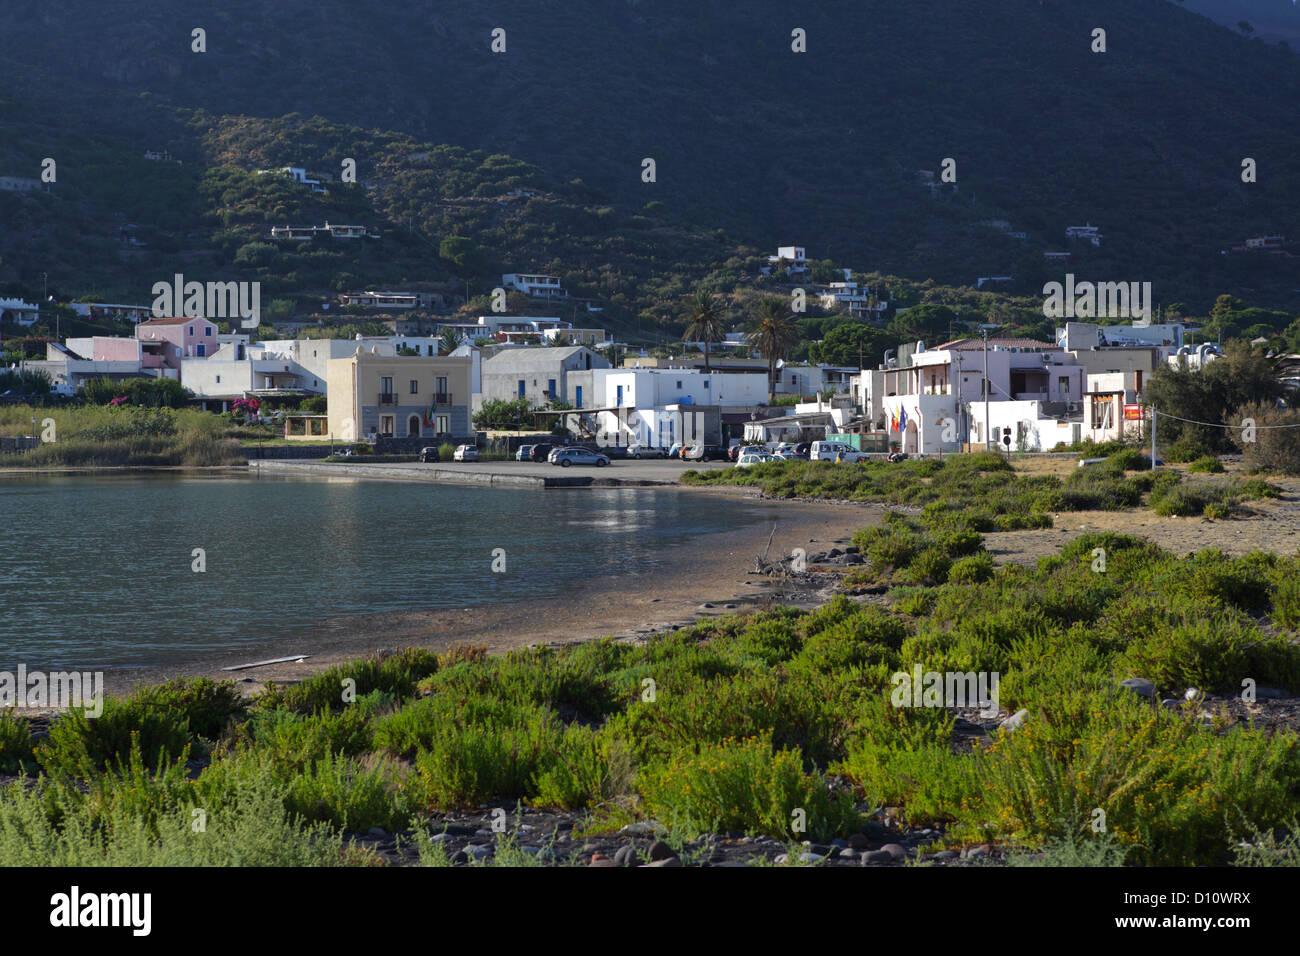 Lingua Village in Salina Island, Aeolian Islands, Sicily, Italy - Stock Image